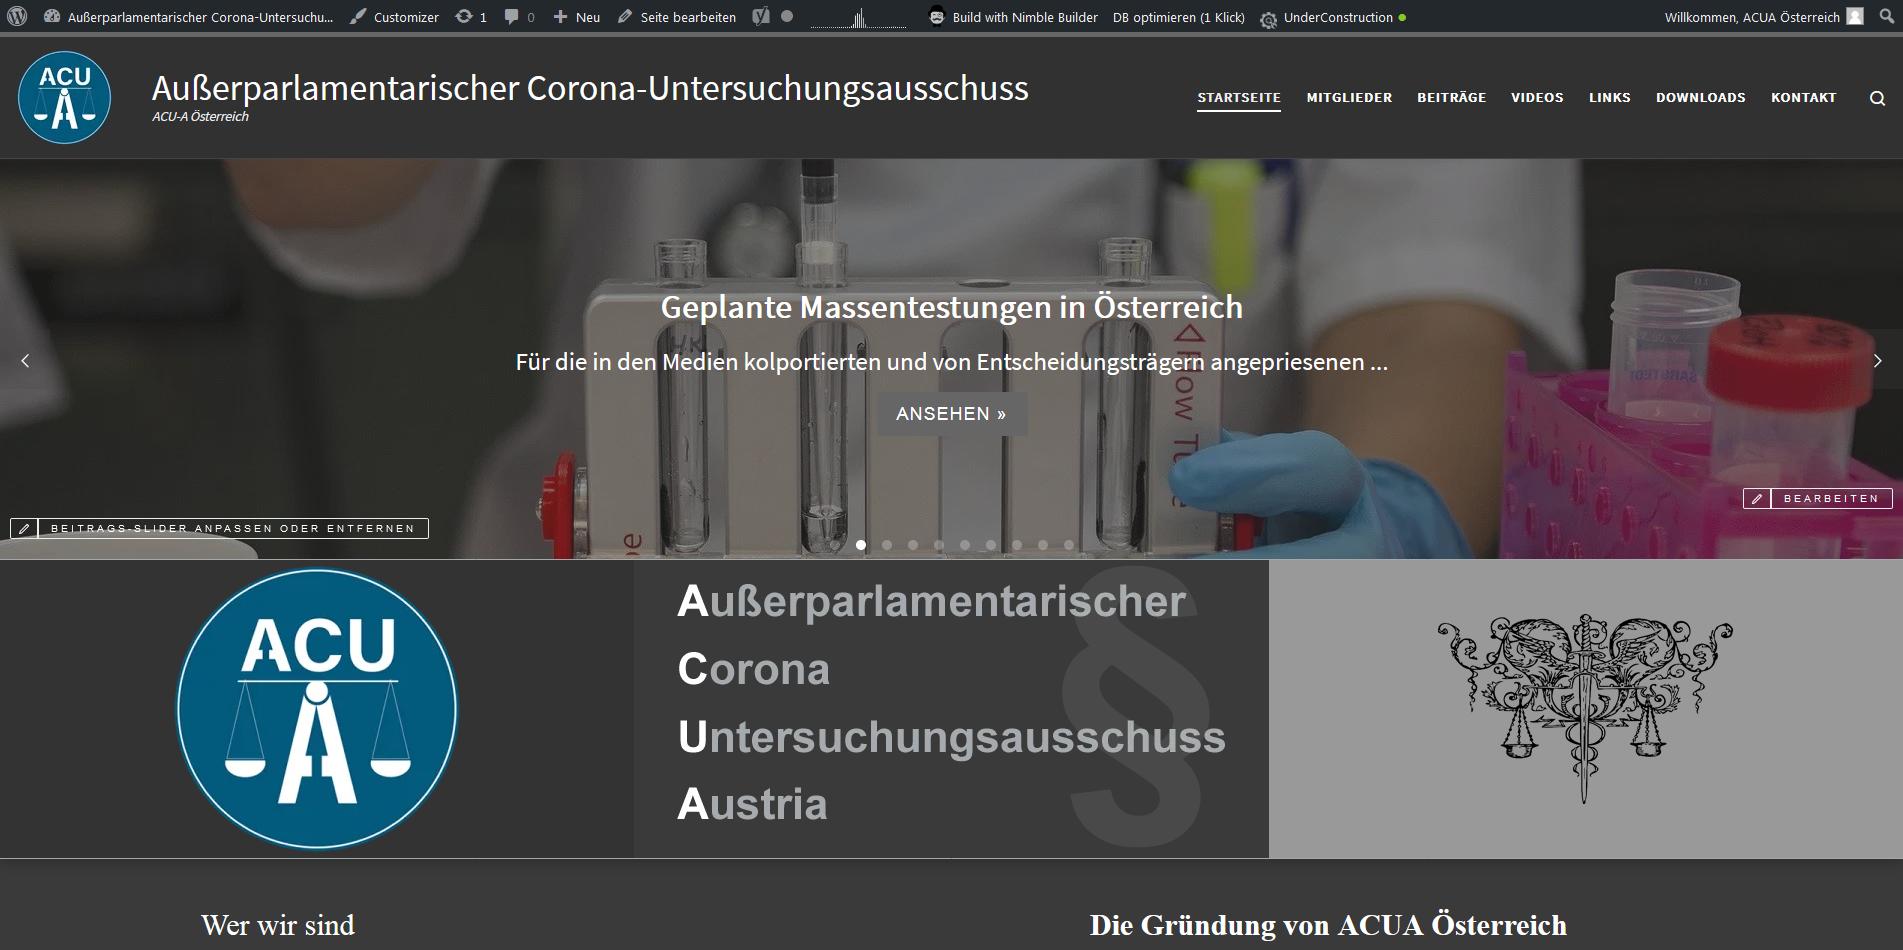 Außerparlamentarischer Corona-Untersuchungsausschuss ACU-A Österreich